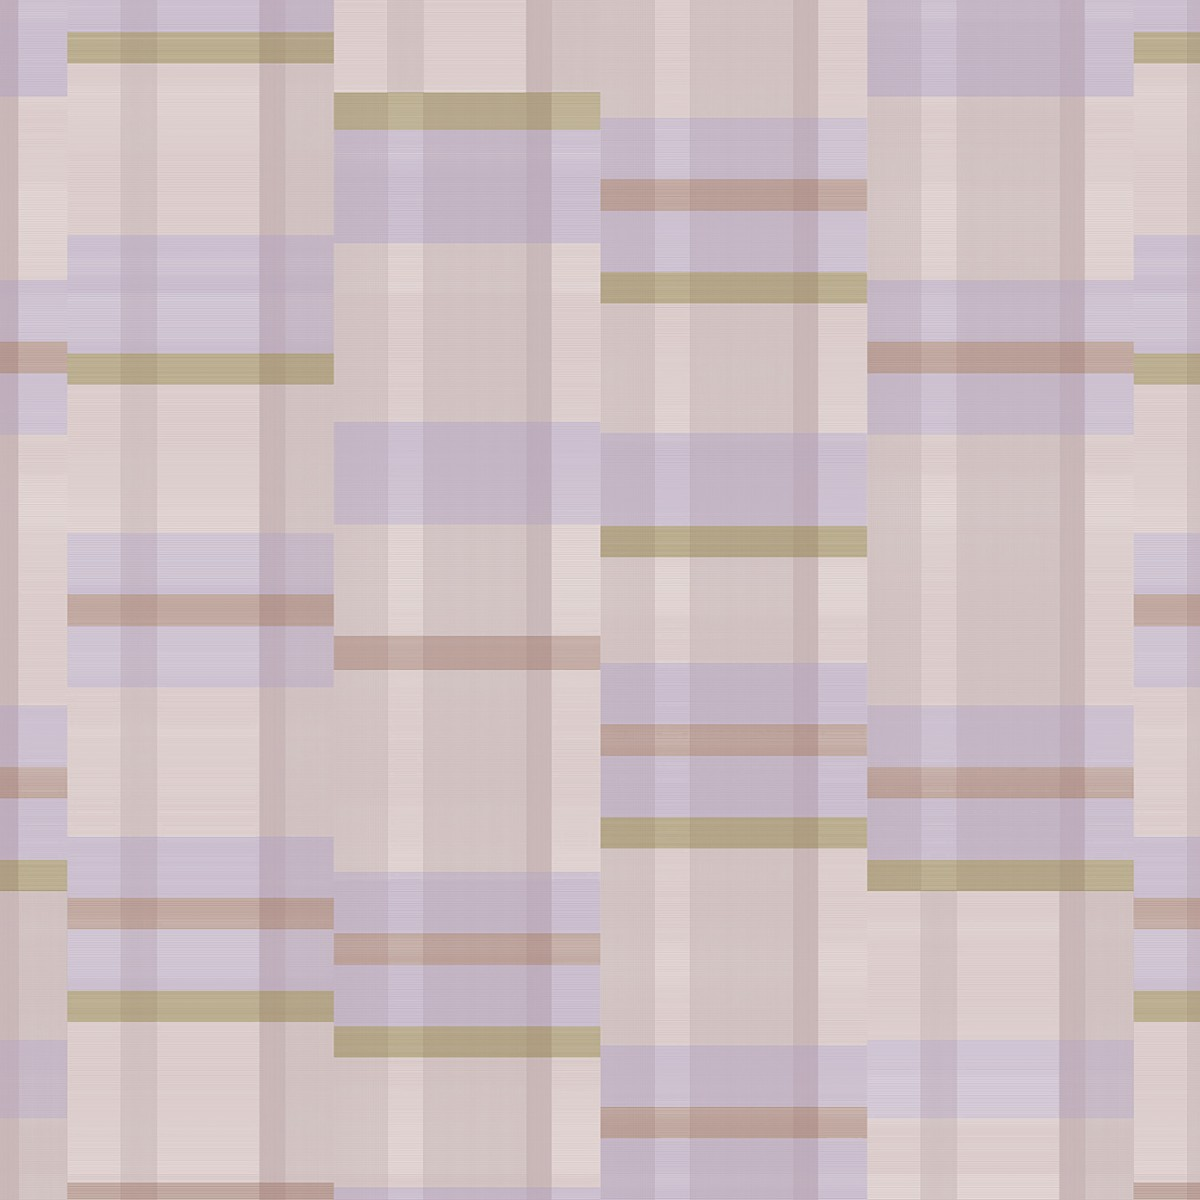 Tapet designer GEOMETRICS - Weave by Fem Studio - Femke Hofhuis, GEO-07, NLXL, 4.9mp / rola